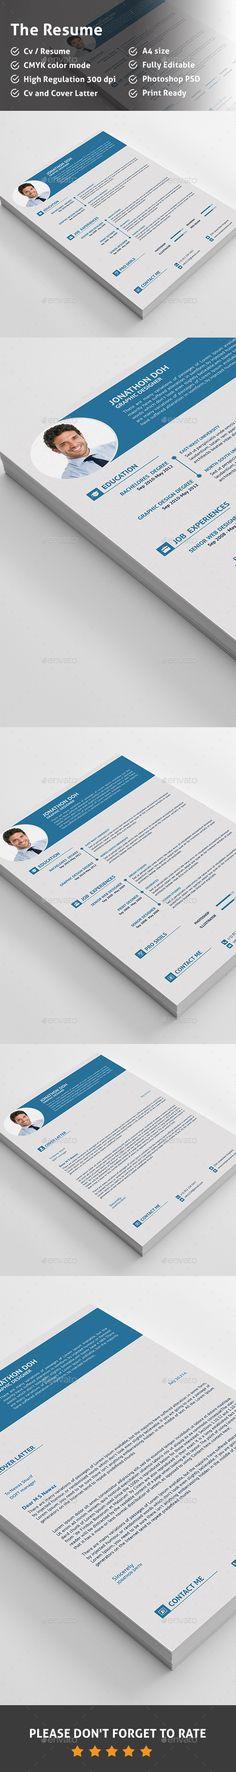 CV Template PSD #design Download: http://graphicriver.net/item/cv/13768588?ref=ksioks